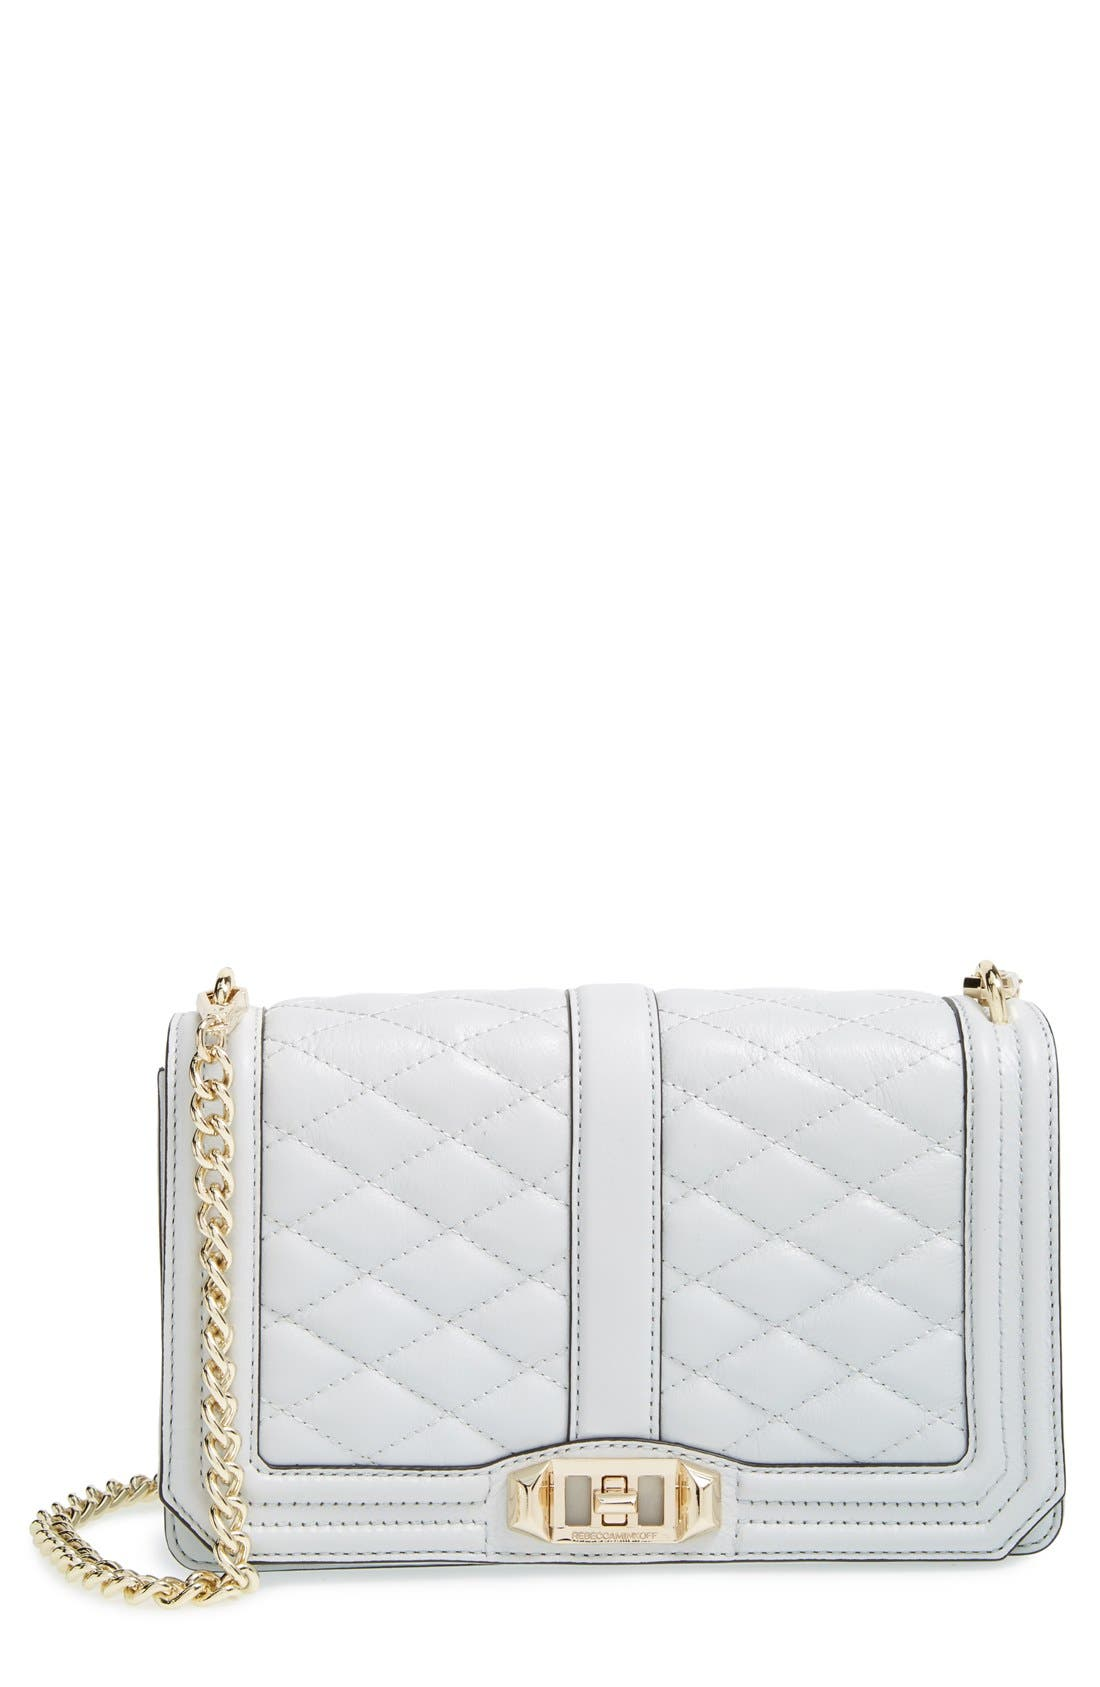 Alternate Image 1 Selected - Rebecca Minkoff Love Leather Crossbody Bag